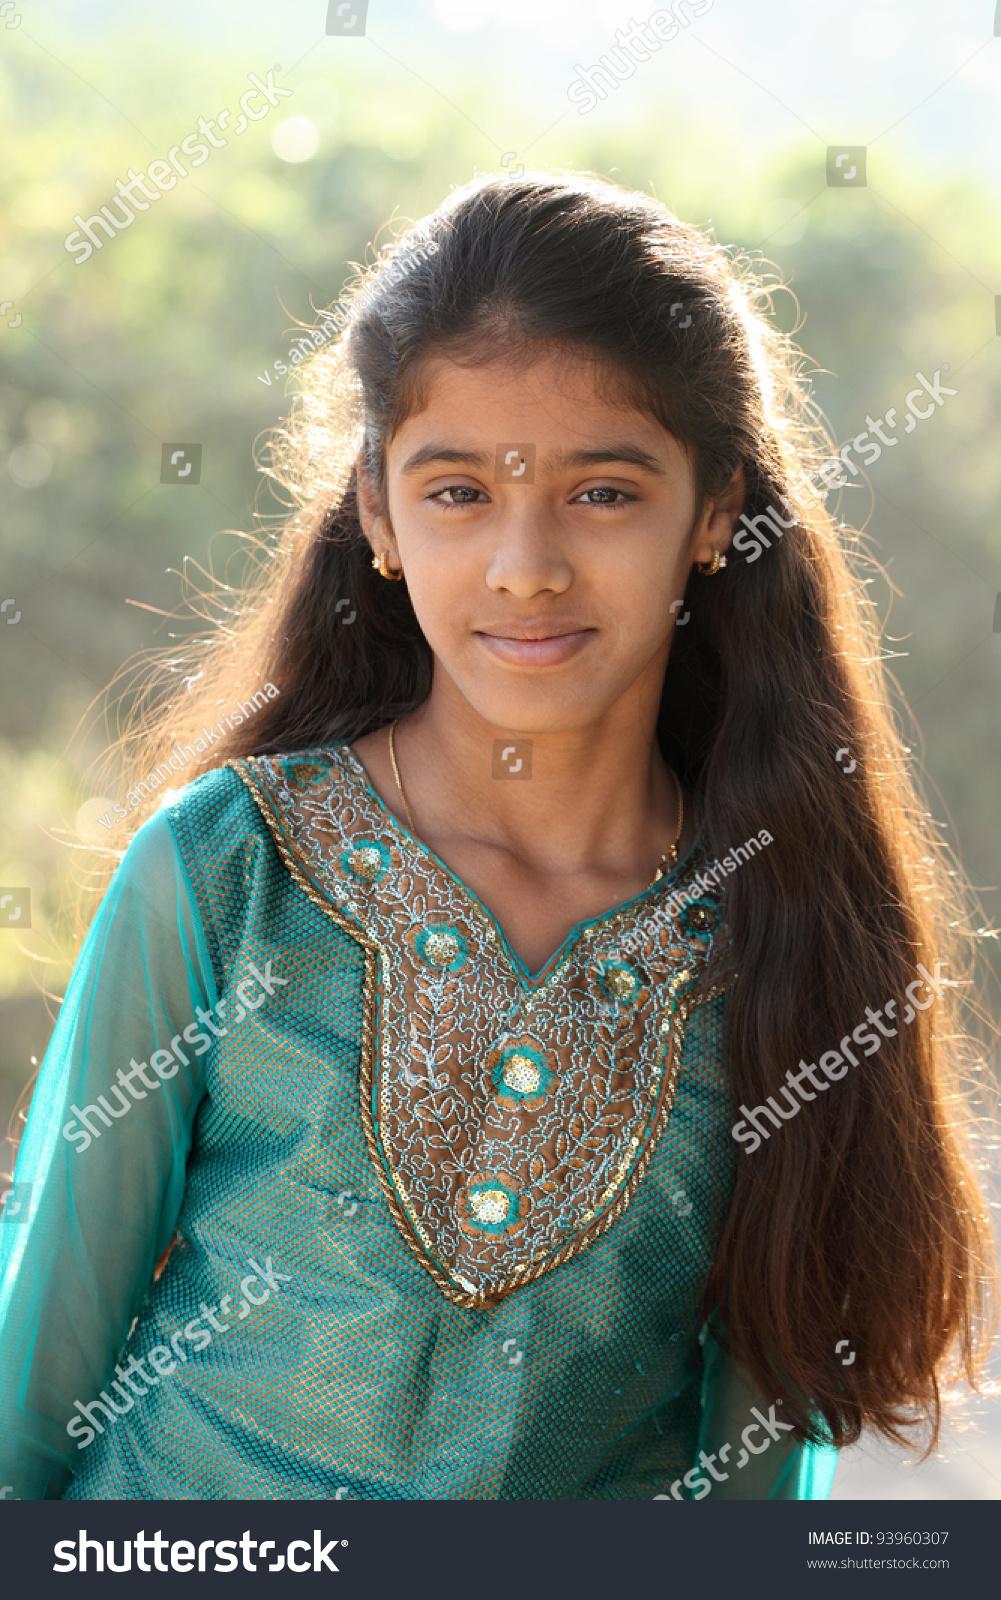 Indian teen beautiful teen girl stock photo 93960307 shutterstock - Image of teen ...